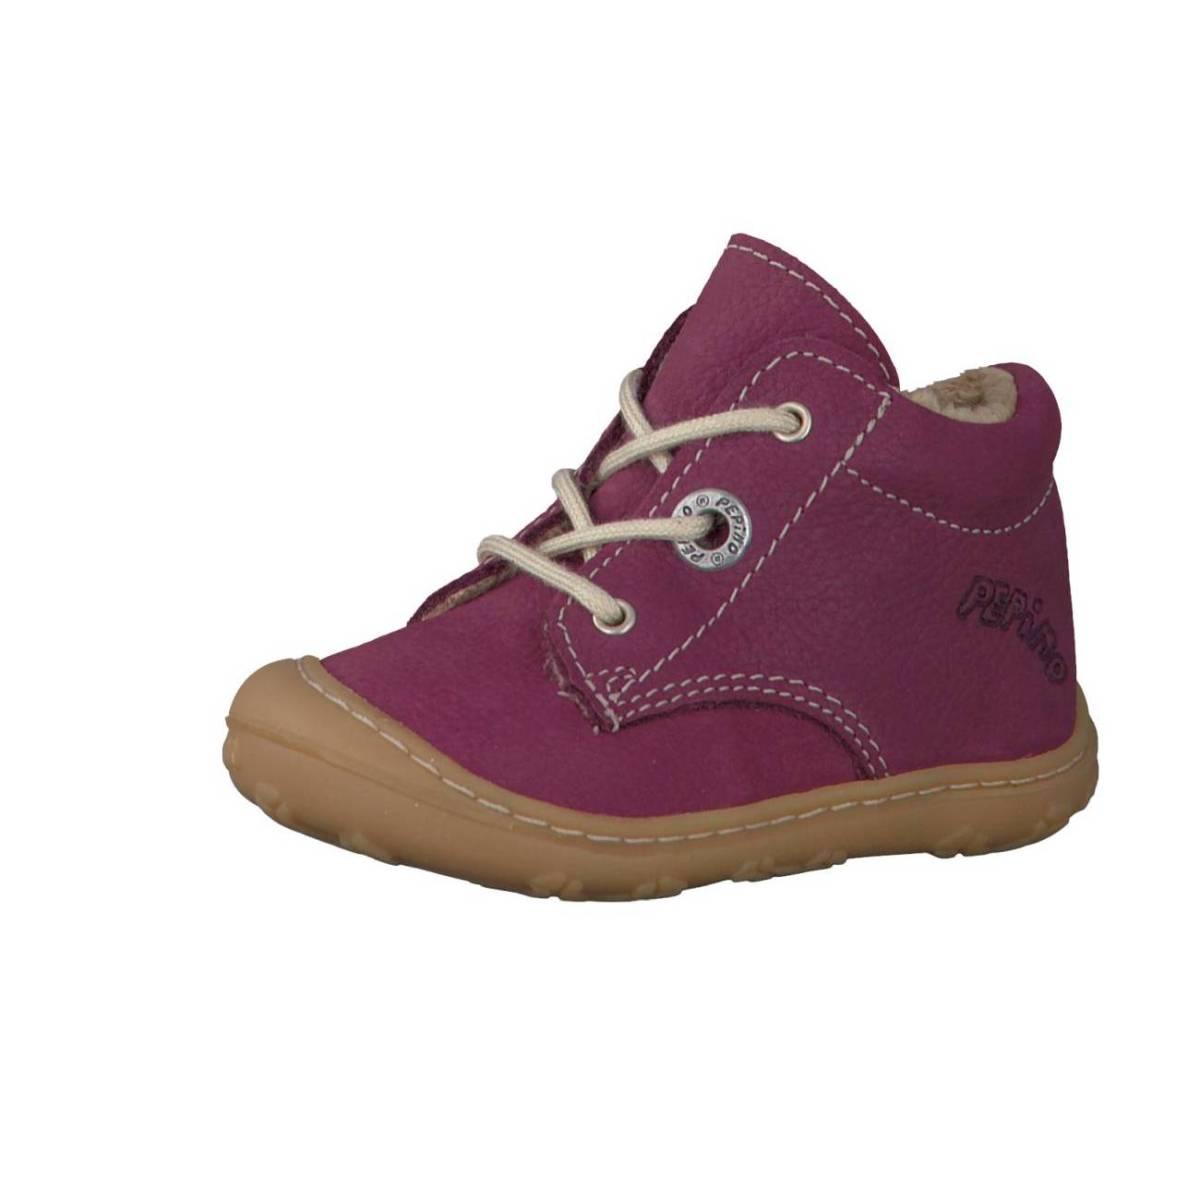 Ricosta Pepino Corany lila fuchsia Lauflernschuhe Stiefelchen Jungen Mädchen